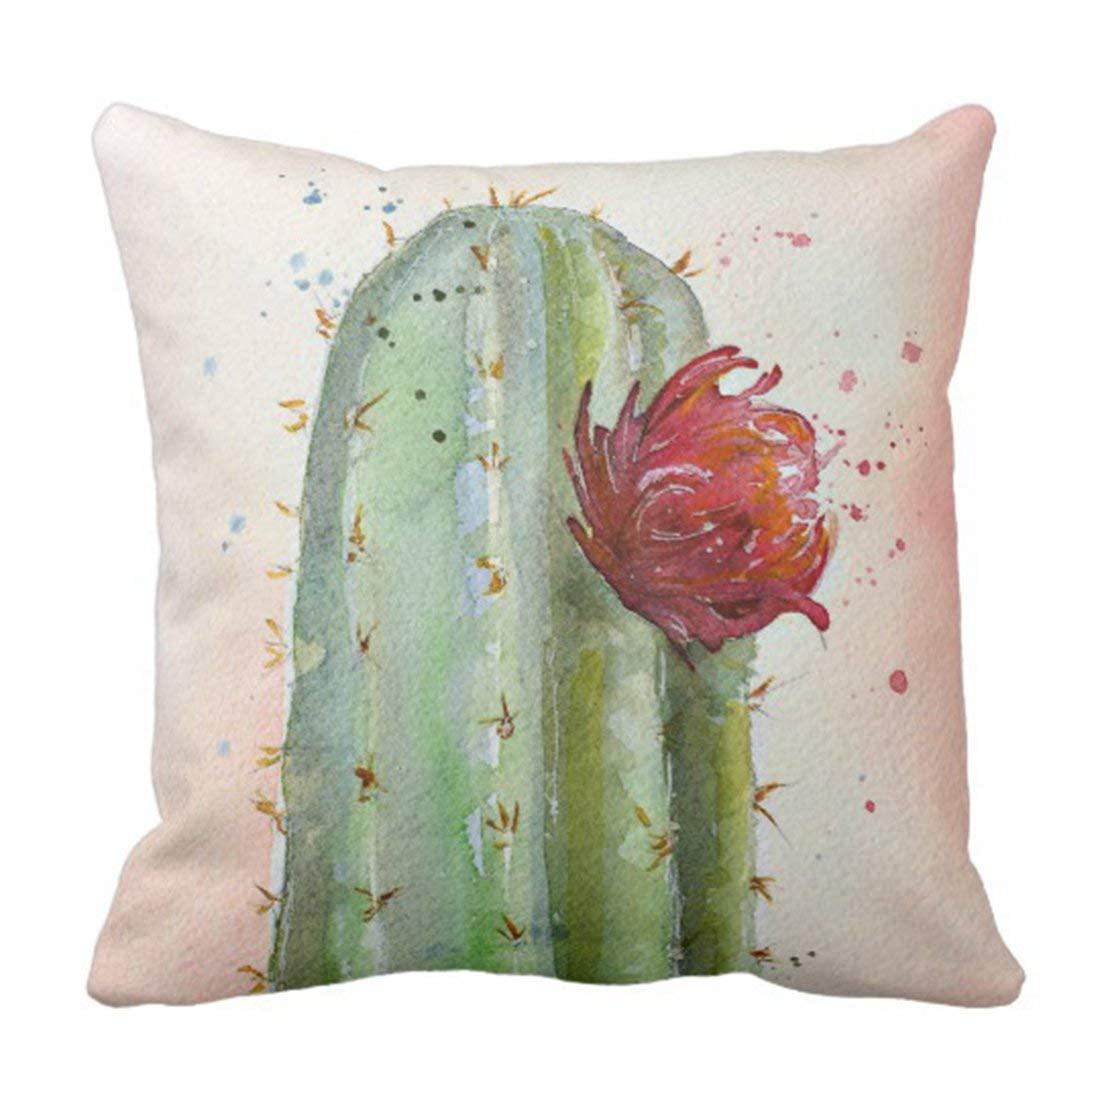 WOPOP Flower Coral Watercolor Flowering Green Bohemian Pillowcase Cover 16x16 inch